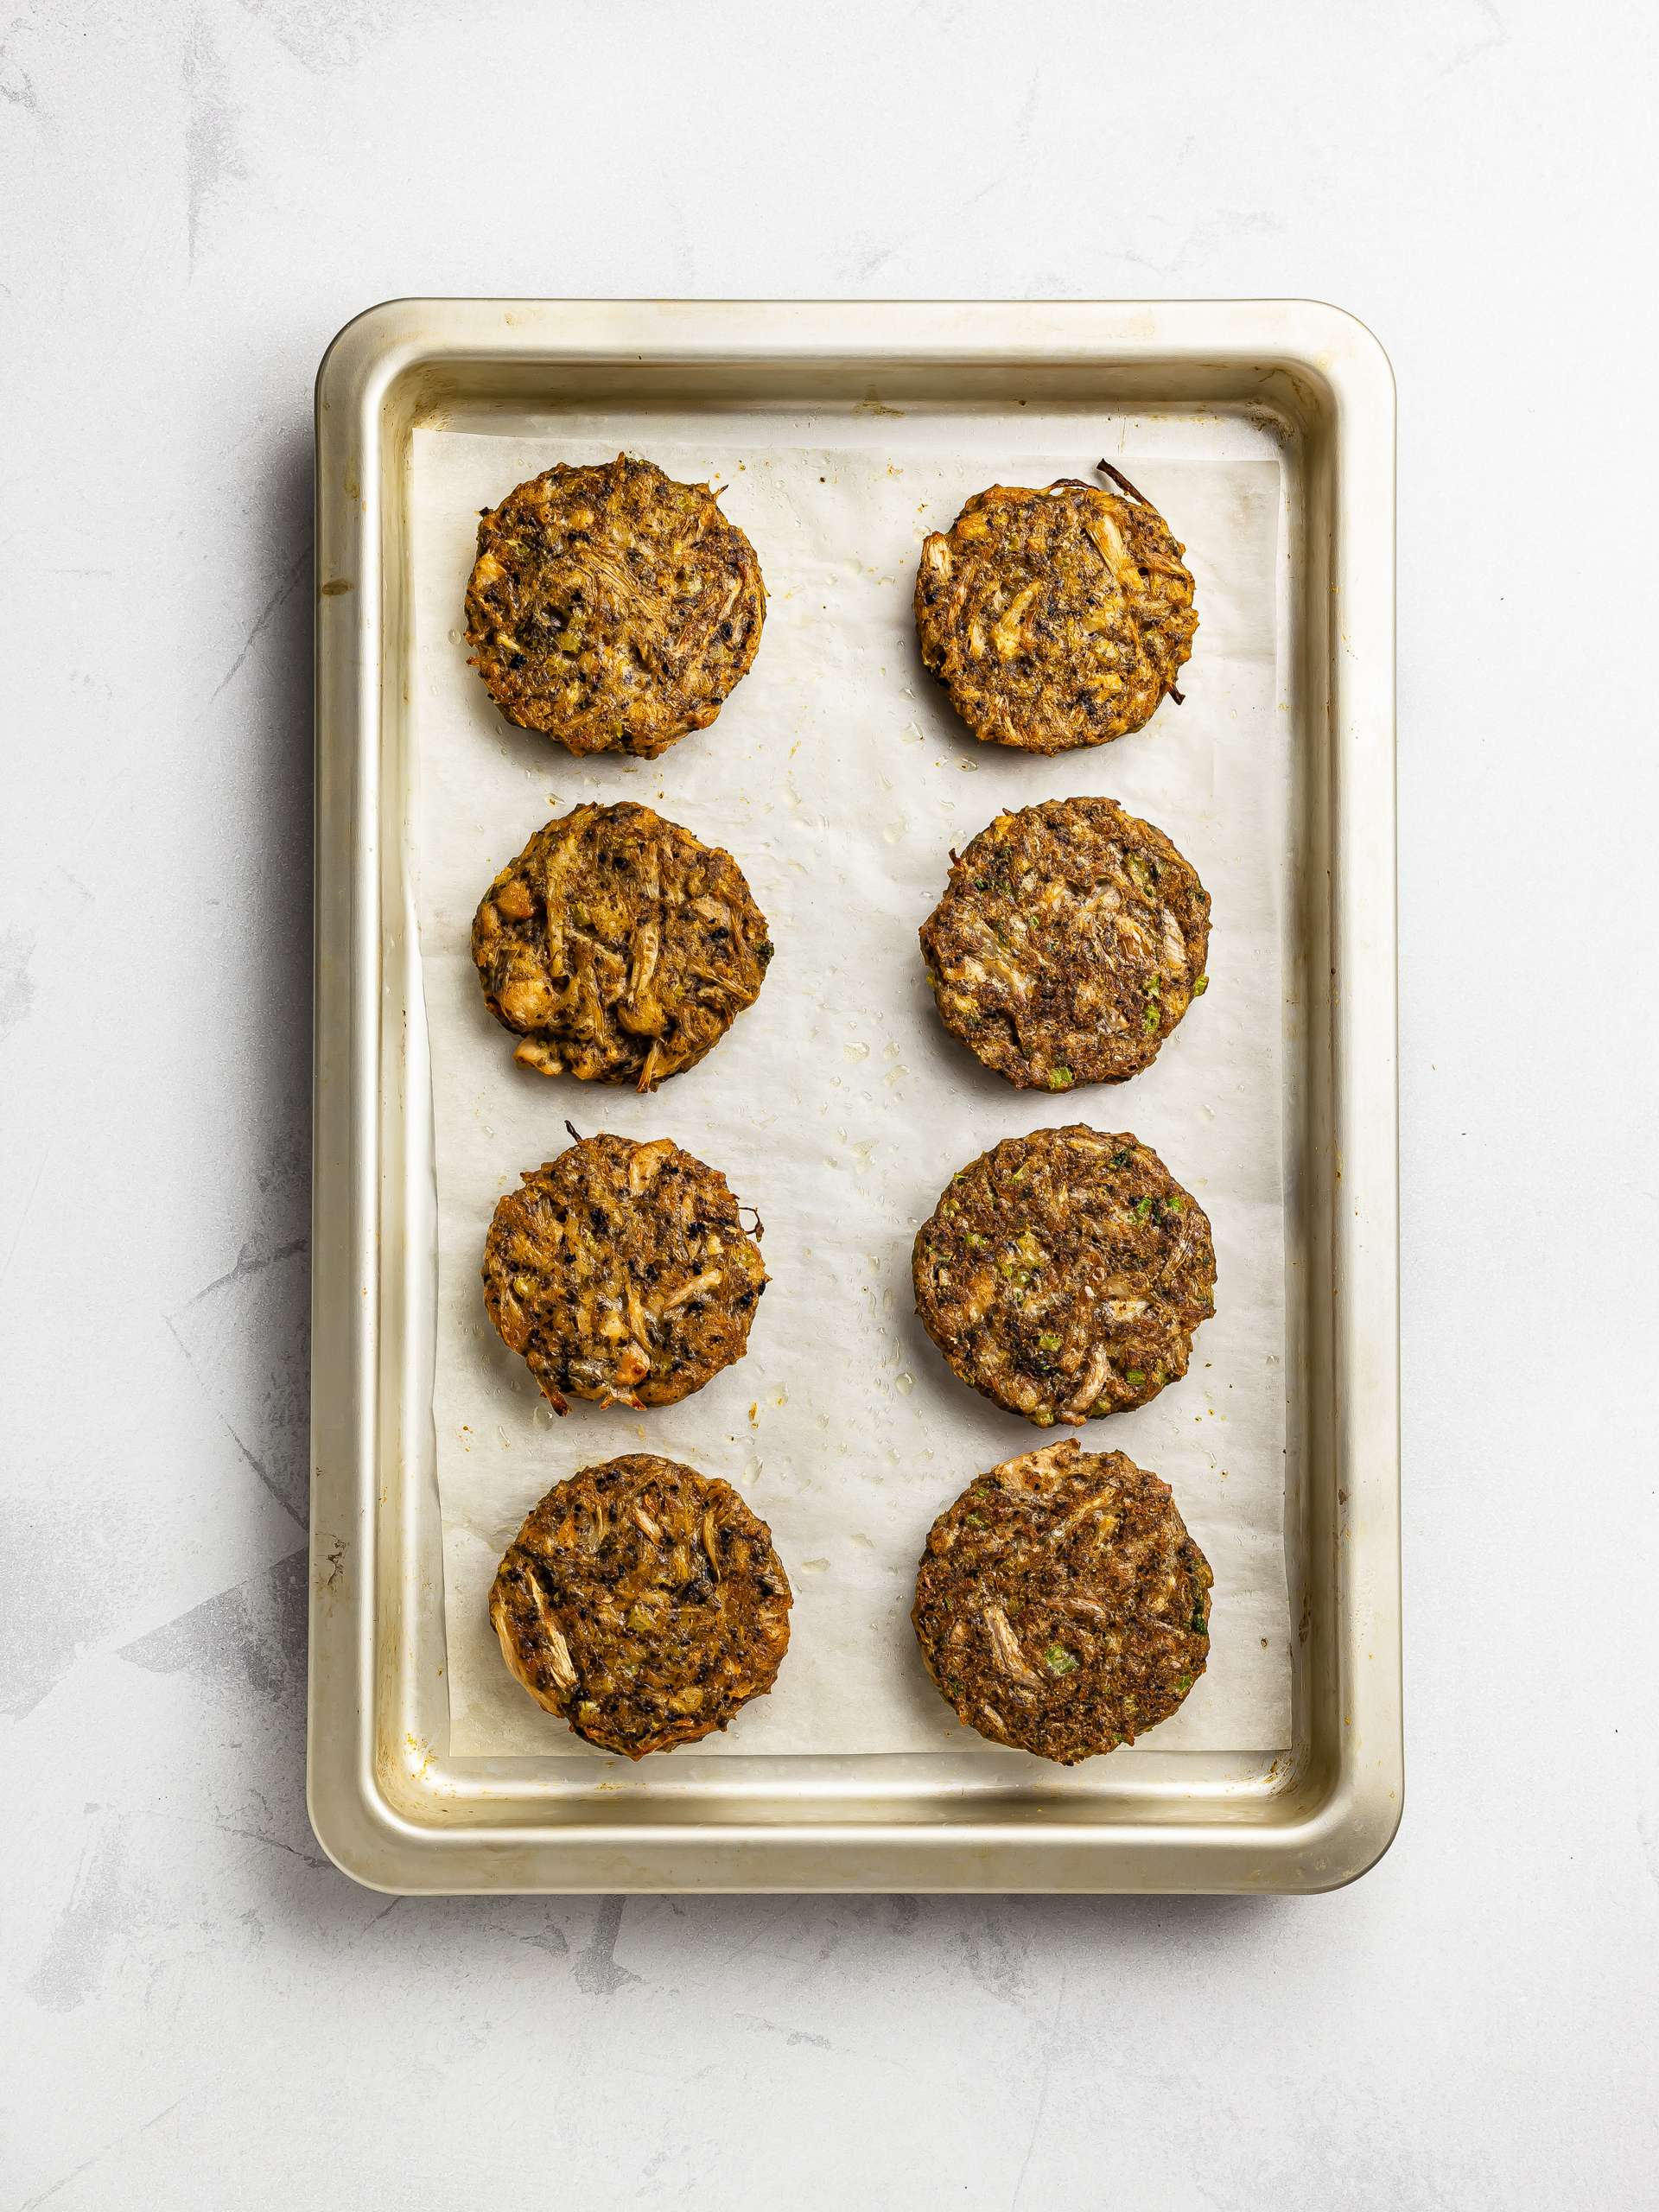 oven-baked jackfruit cakes